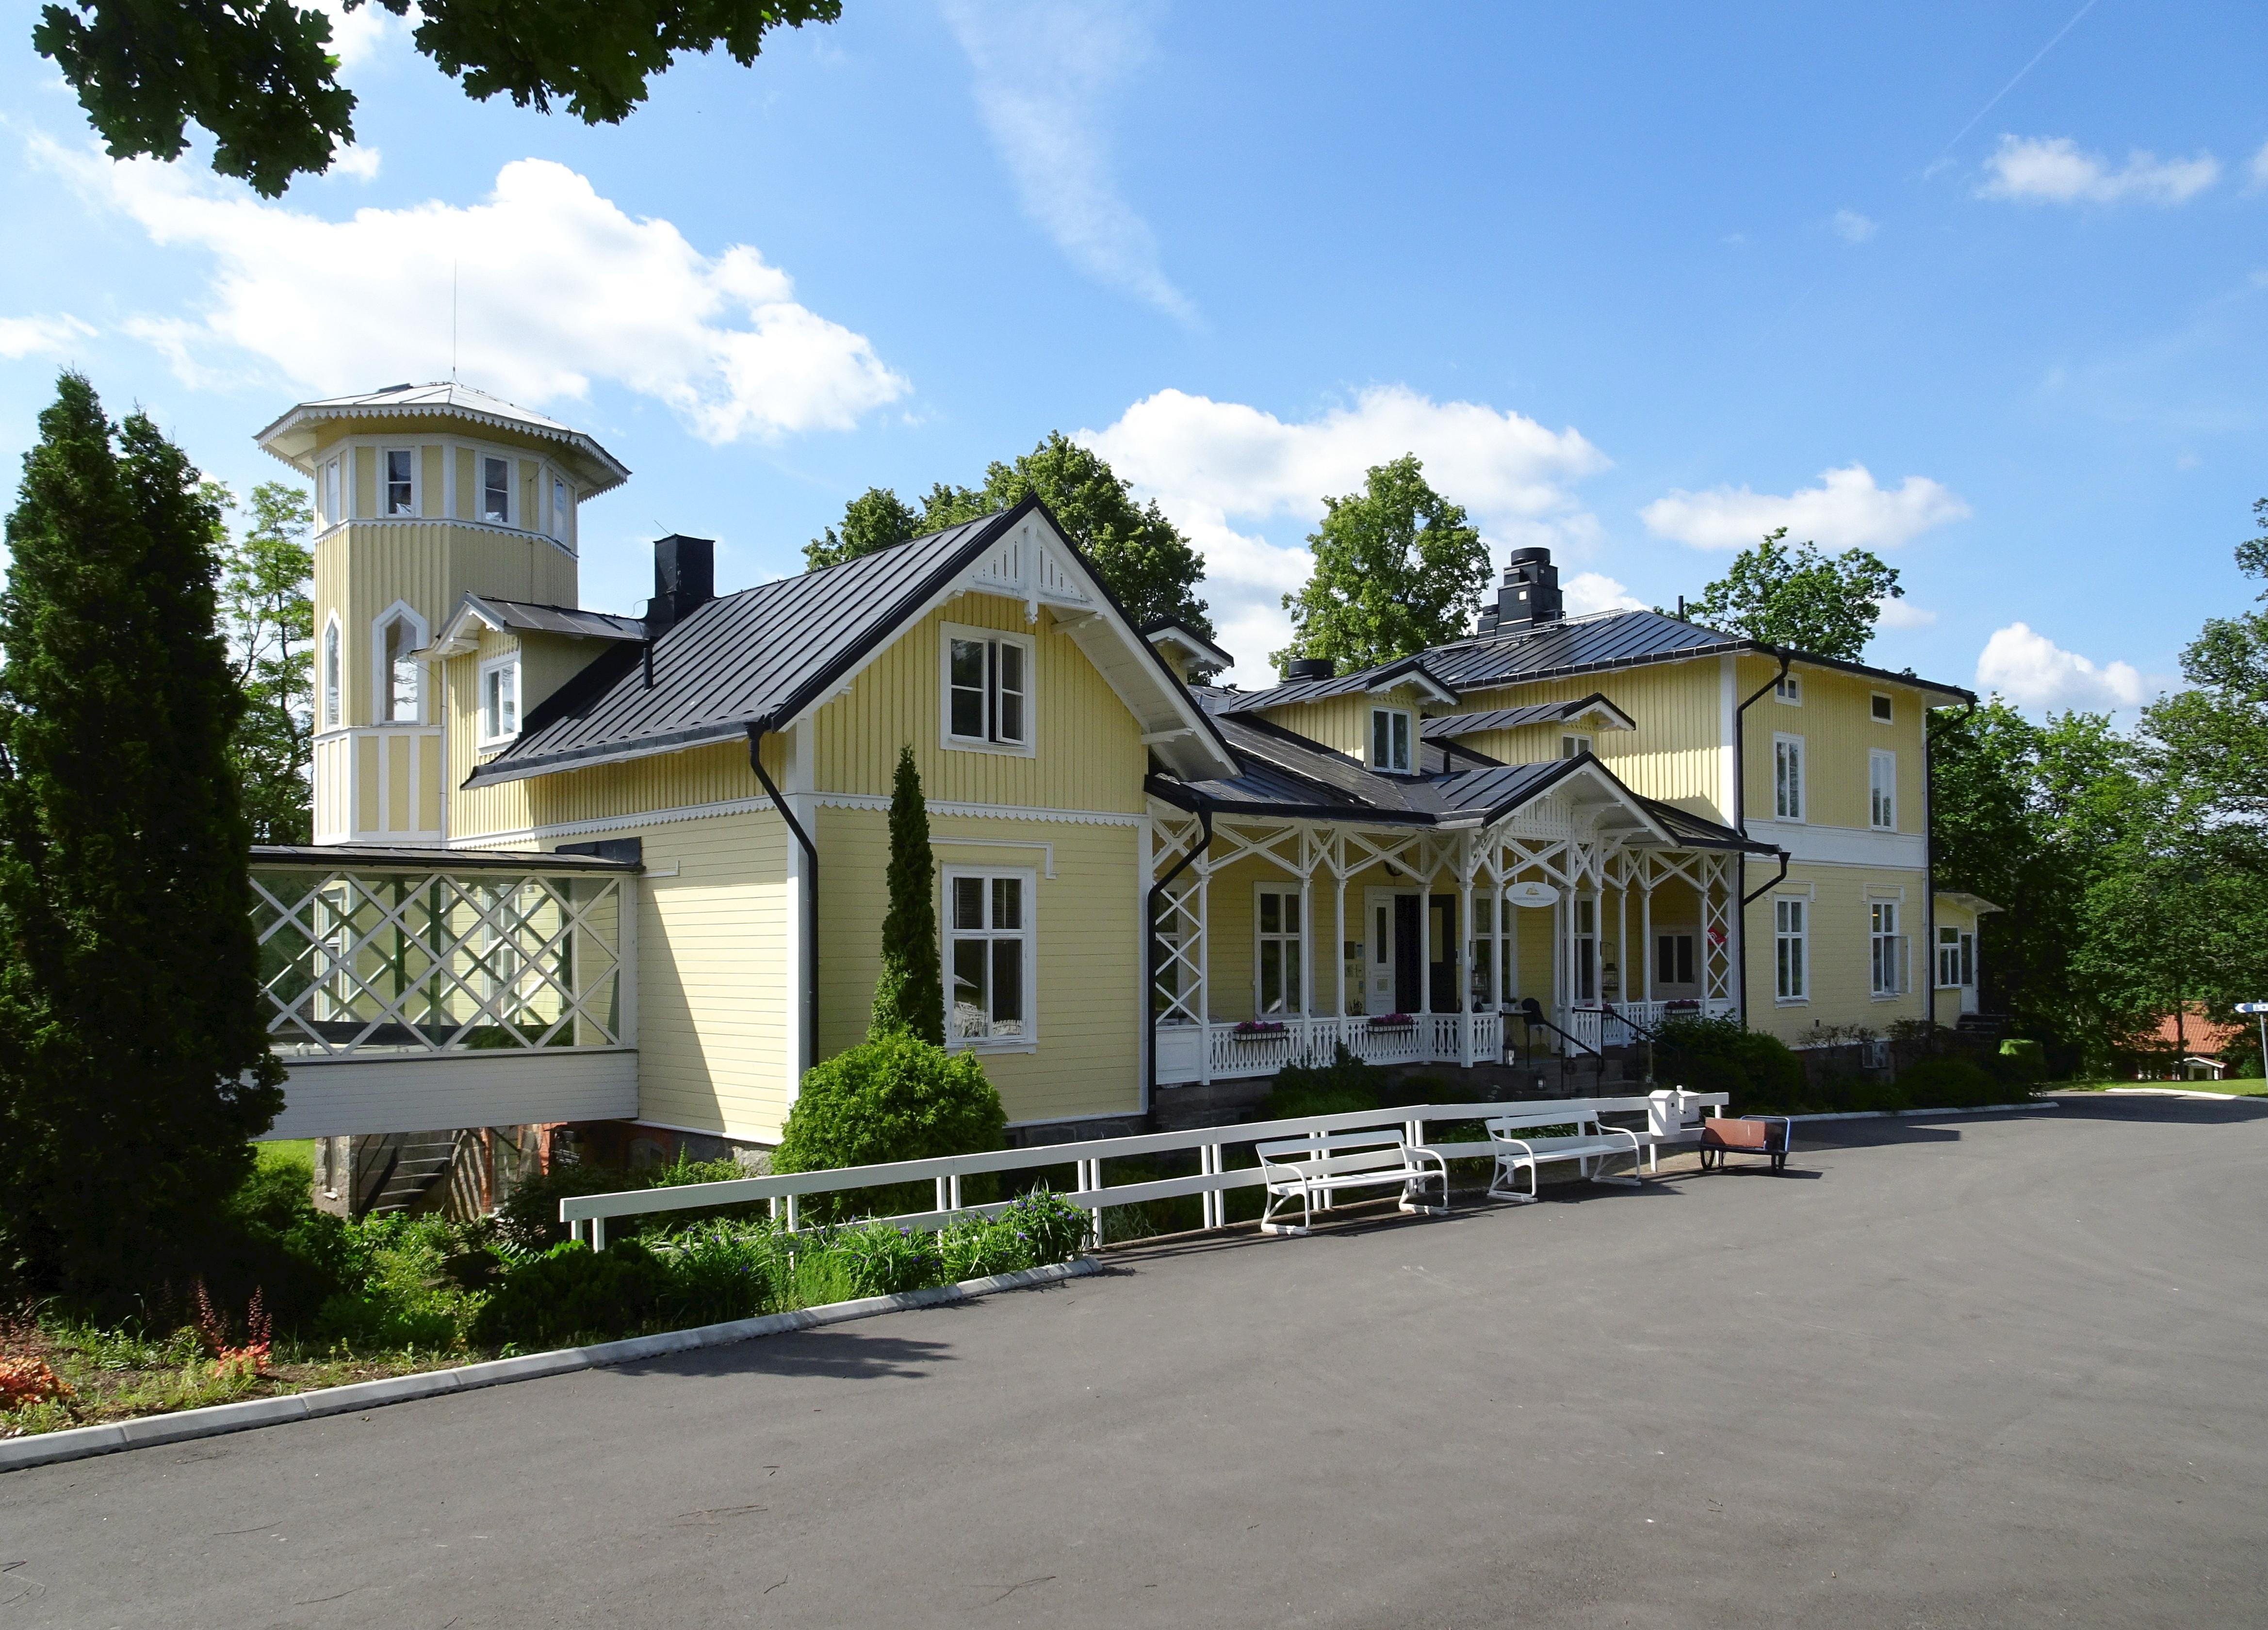 Fredensborgs Herrgard Wikipedia